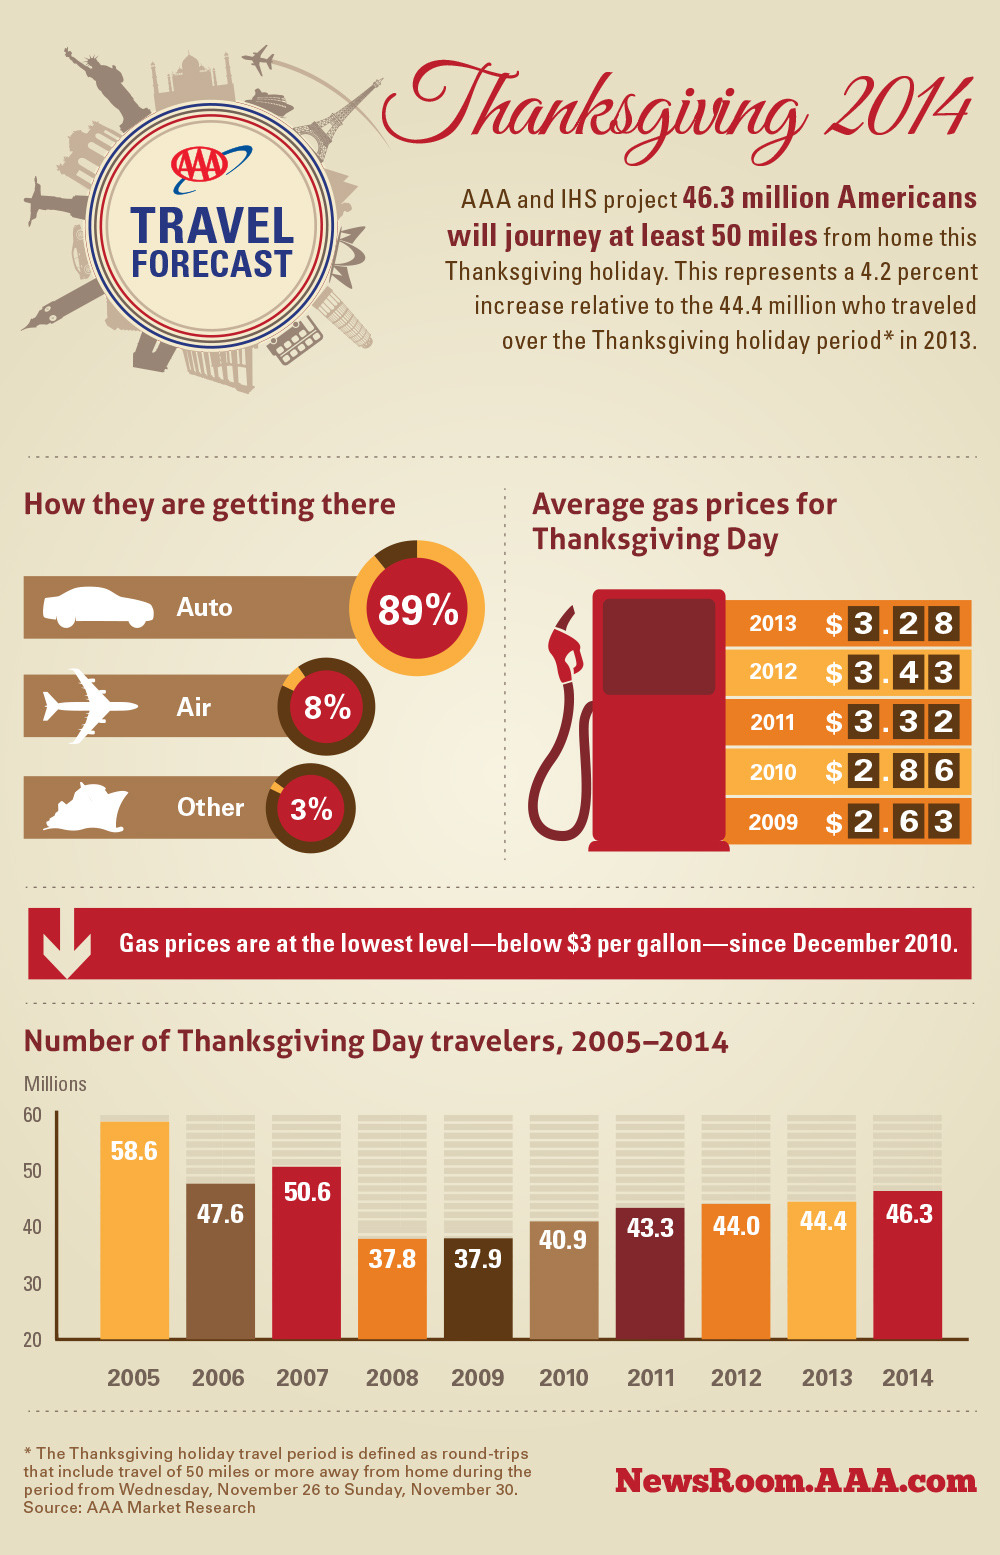 8eacdce1e84549a3398e_AAA_2014-Travel-Forecast-Thanksgiving.jpg